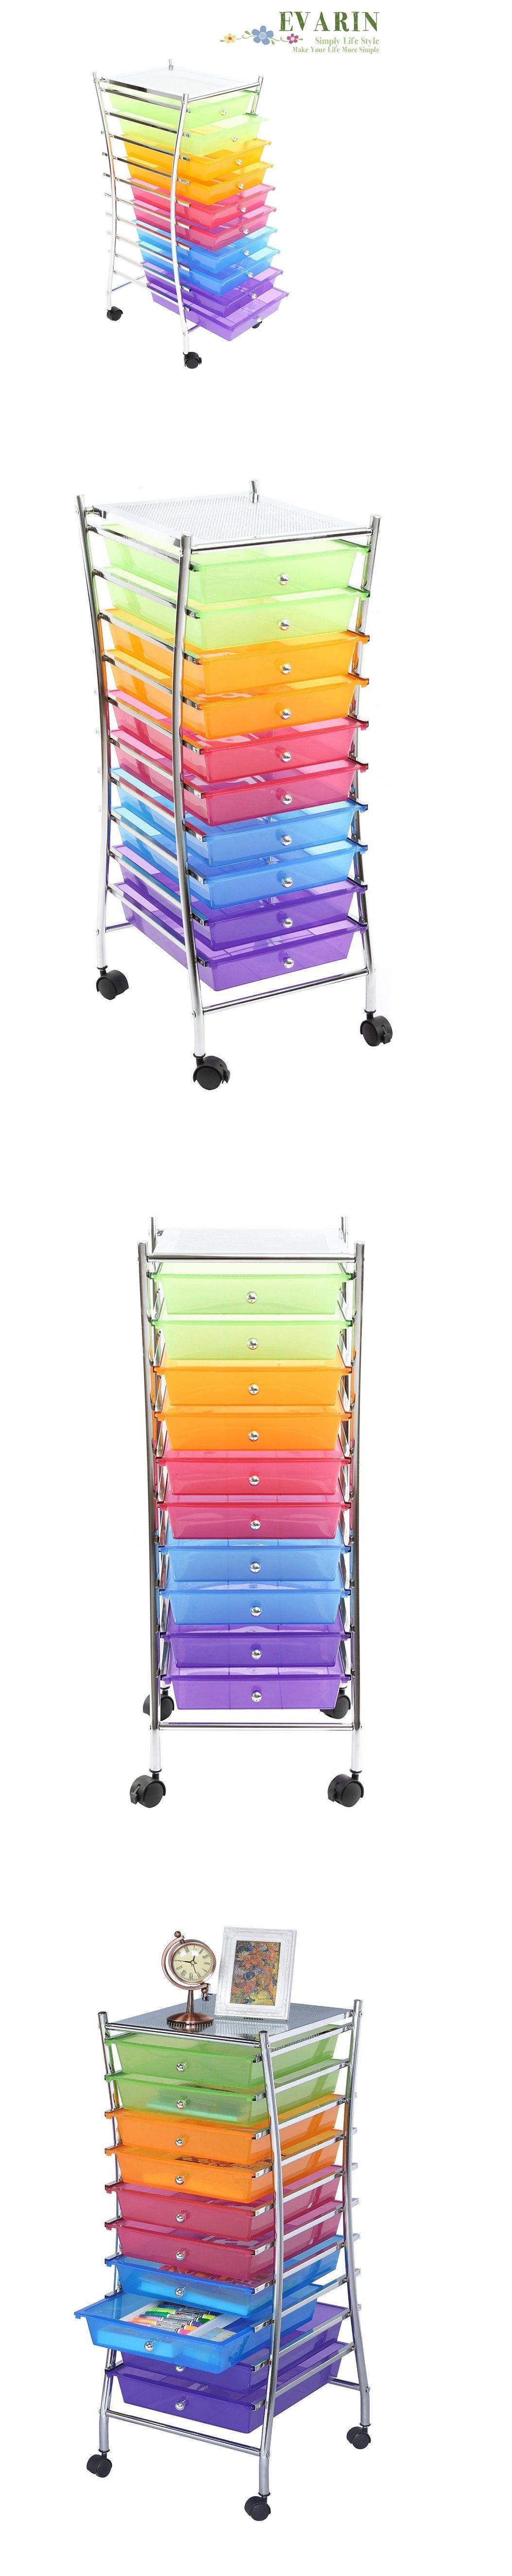 Craft Carts 146400: 10 Drawer Plastic Storage Container Box Organize Cart  Beauty Salon Office School